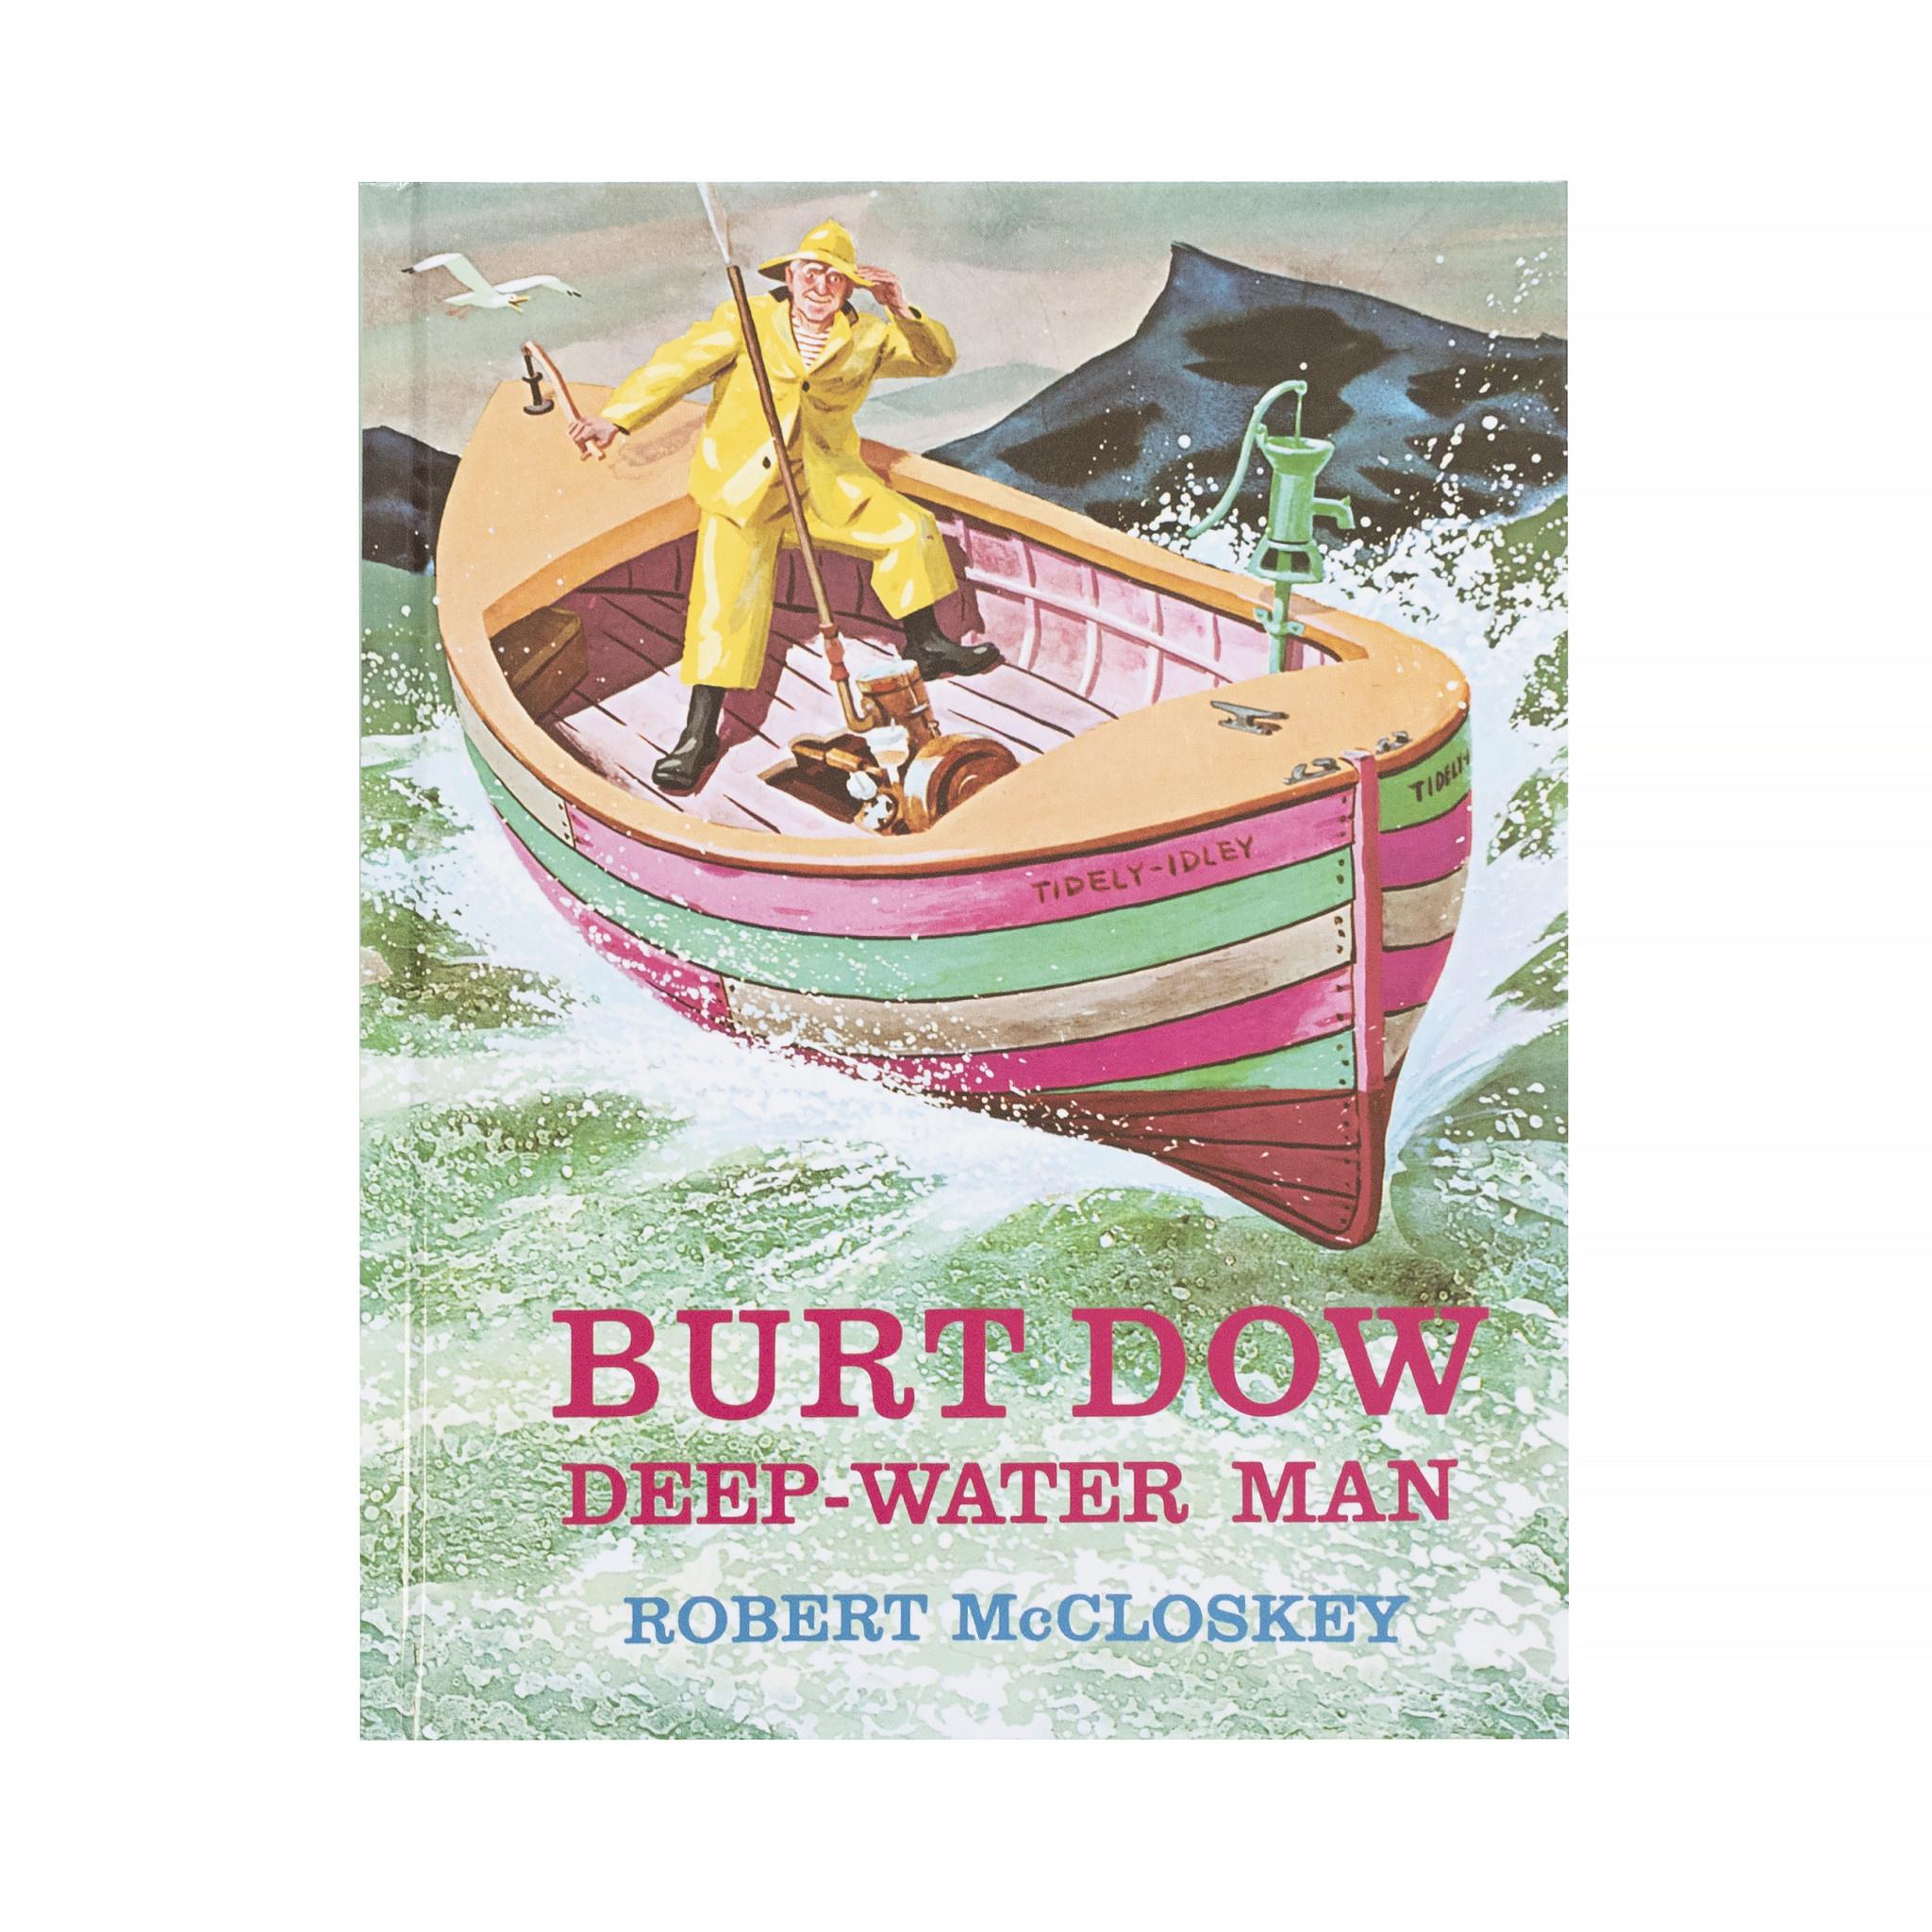 Penguin Burt Dow Deep-Water Man